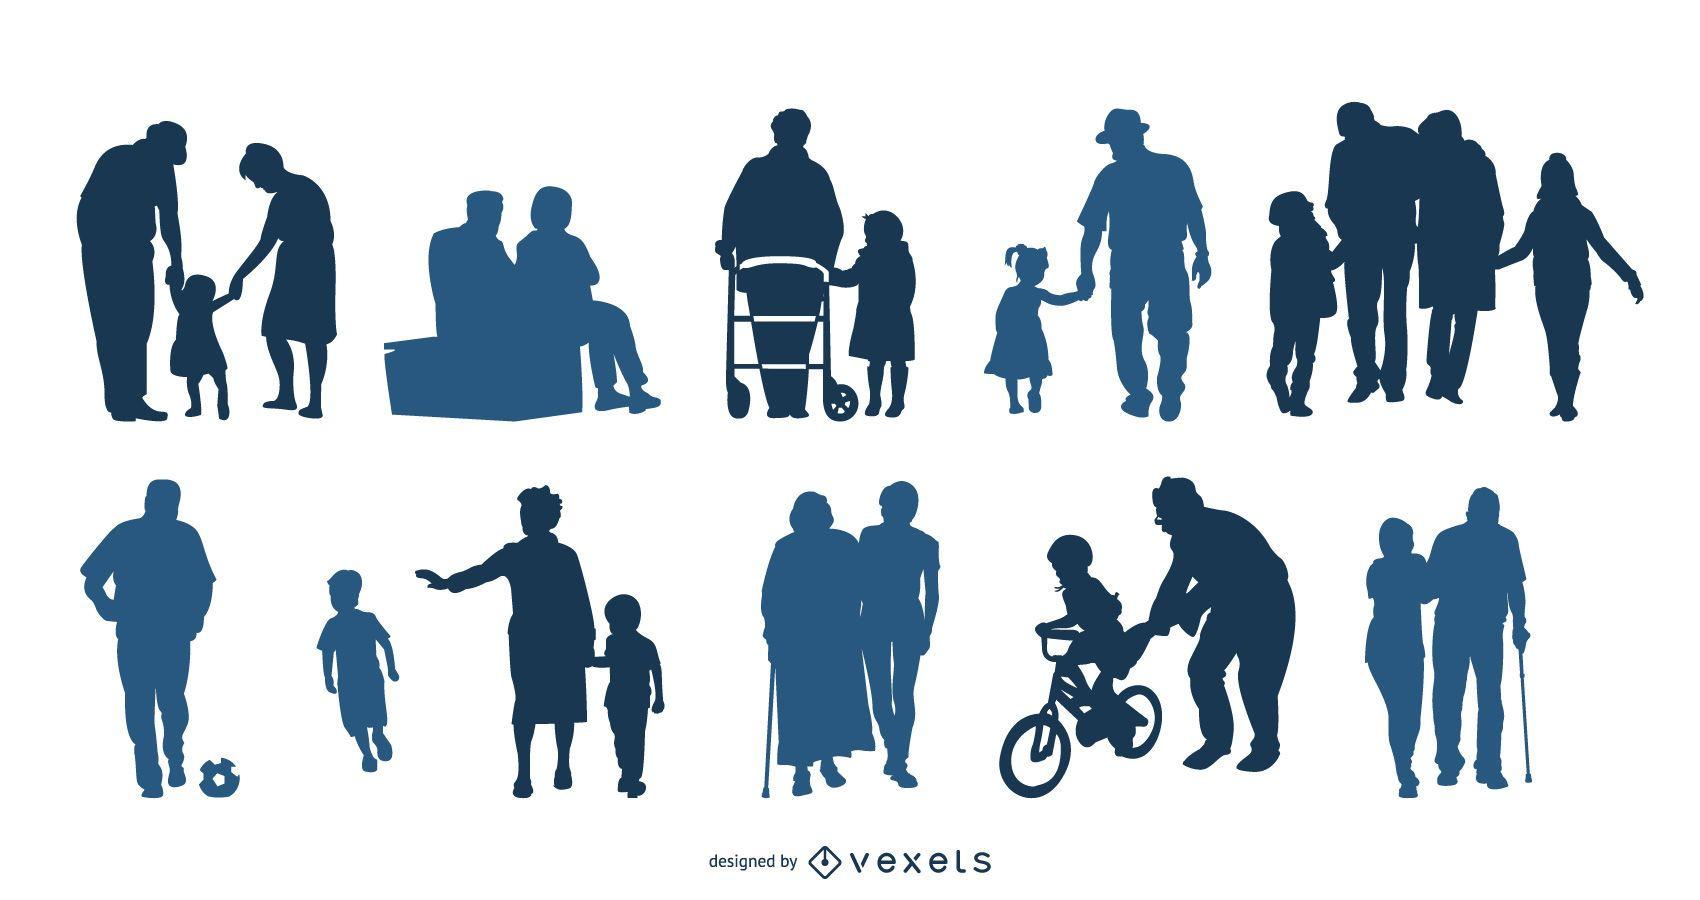 Pacote de vetores de silhueta para avós